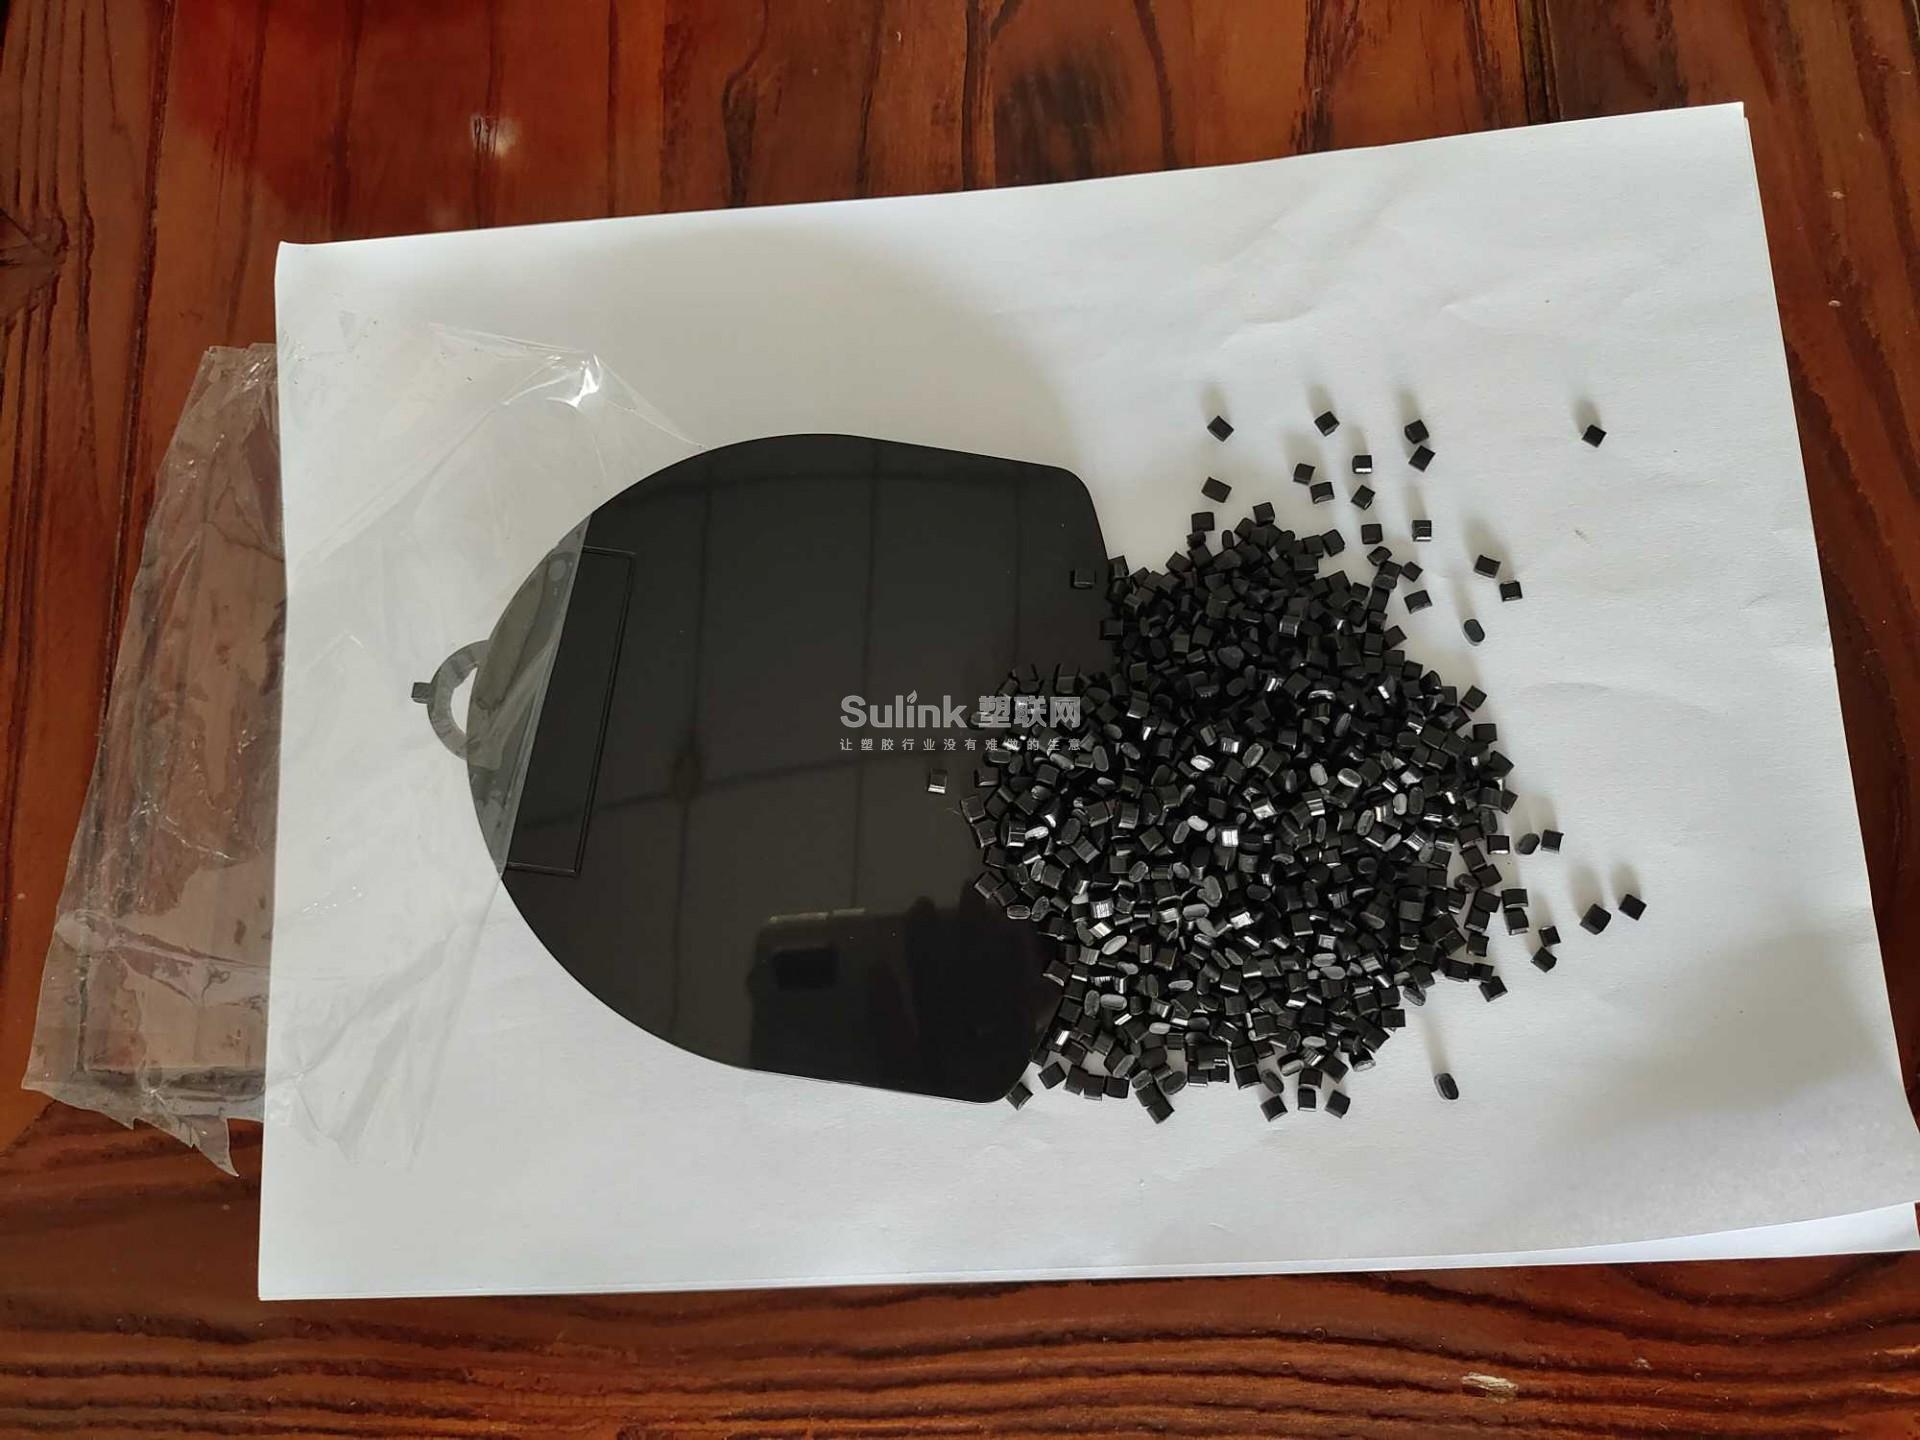 ABS黑色阻燃副牌- 塑联网 - 塑料联网信息服务平台